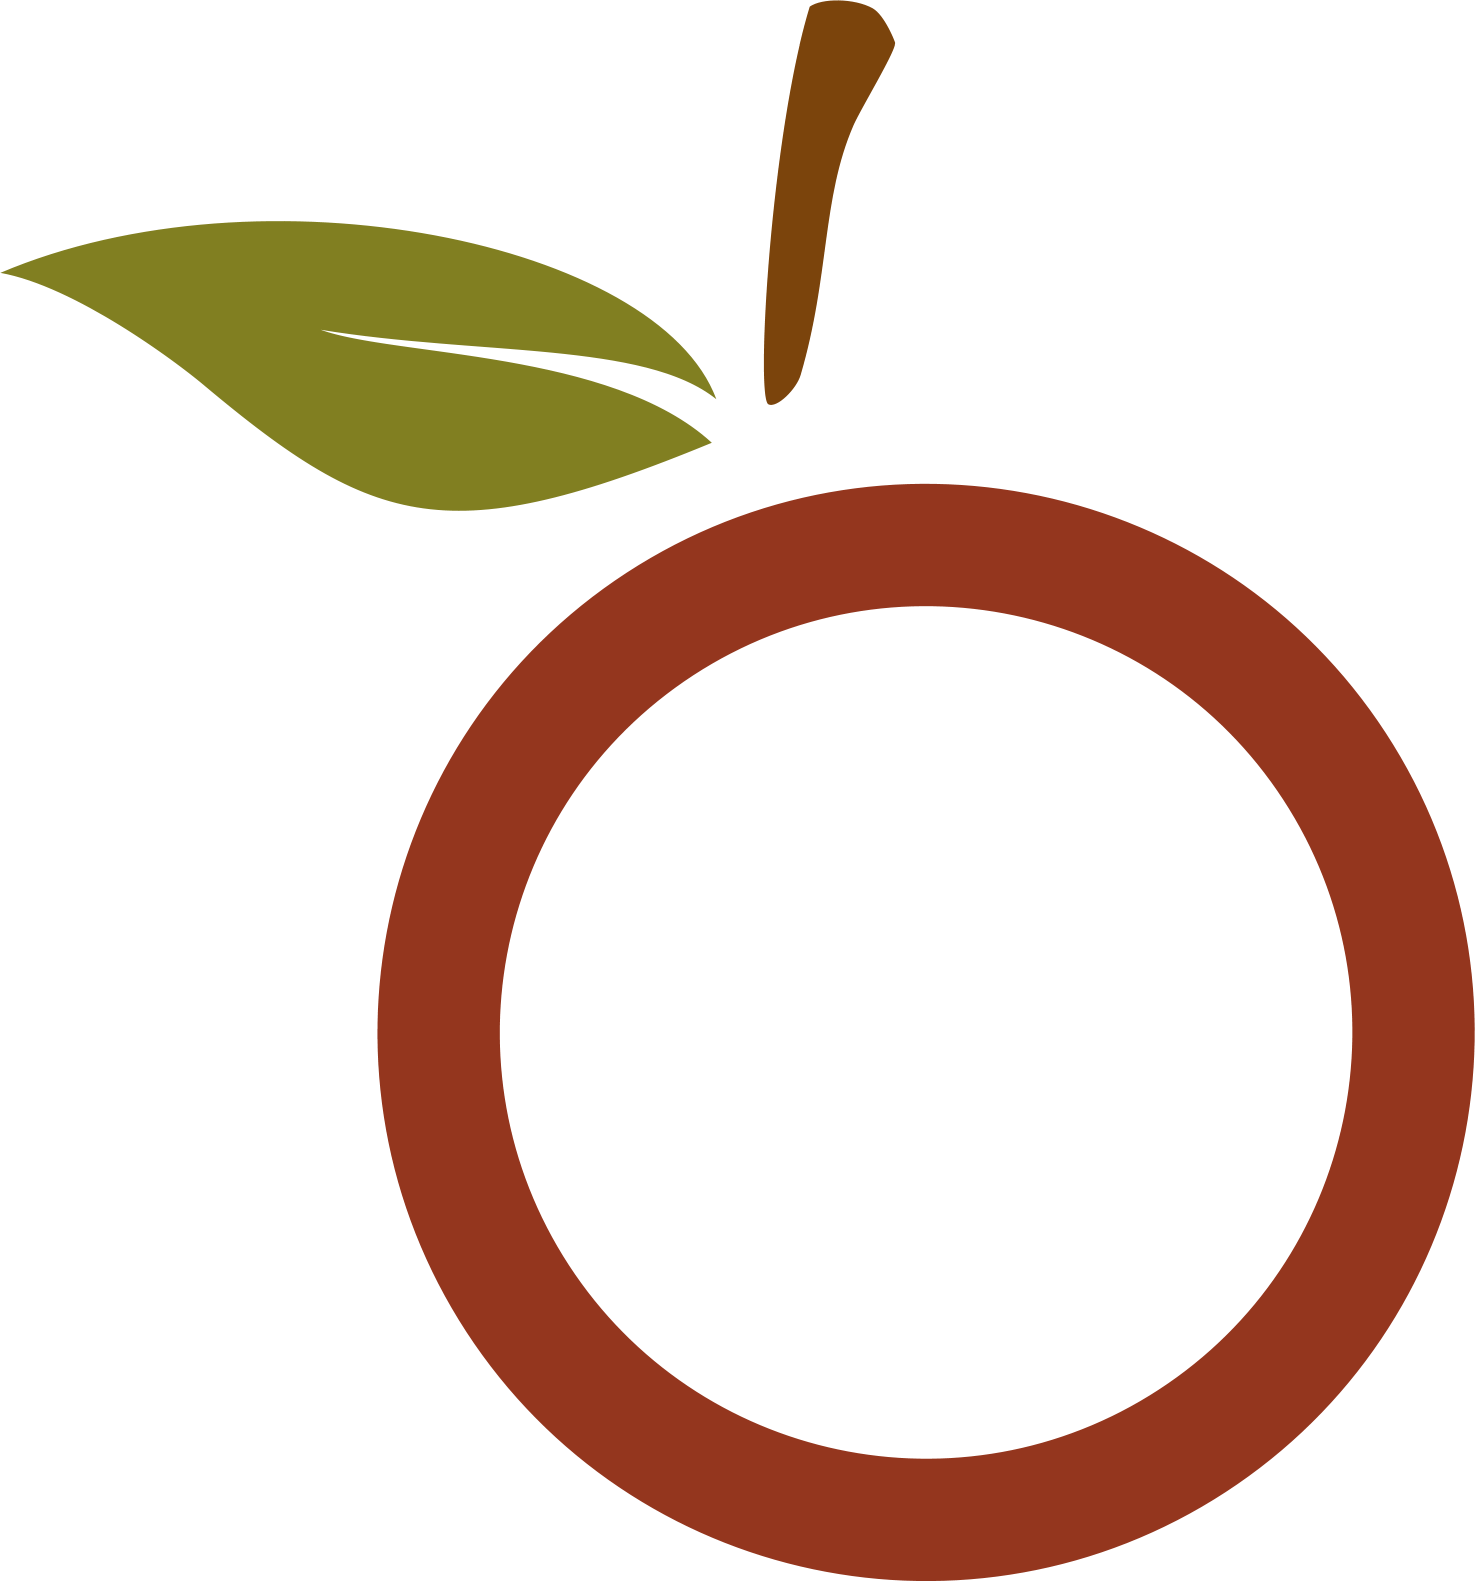 Berwick Chiropractic Apple.png